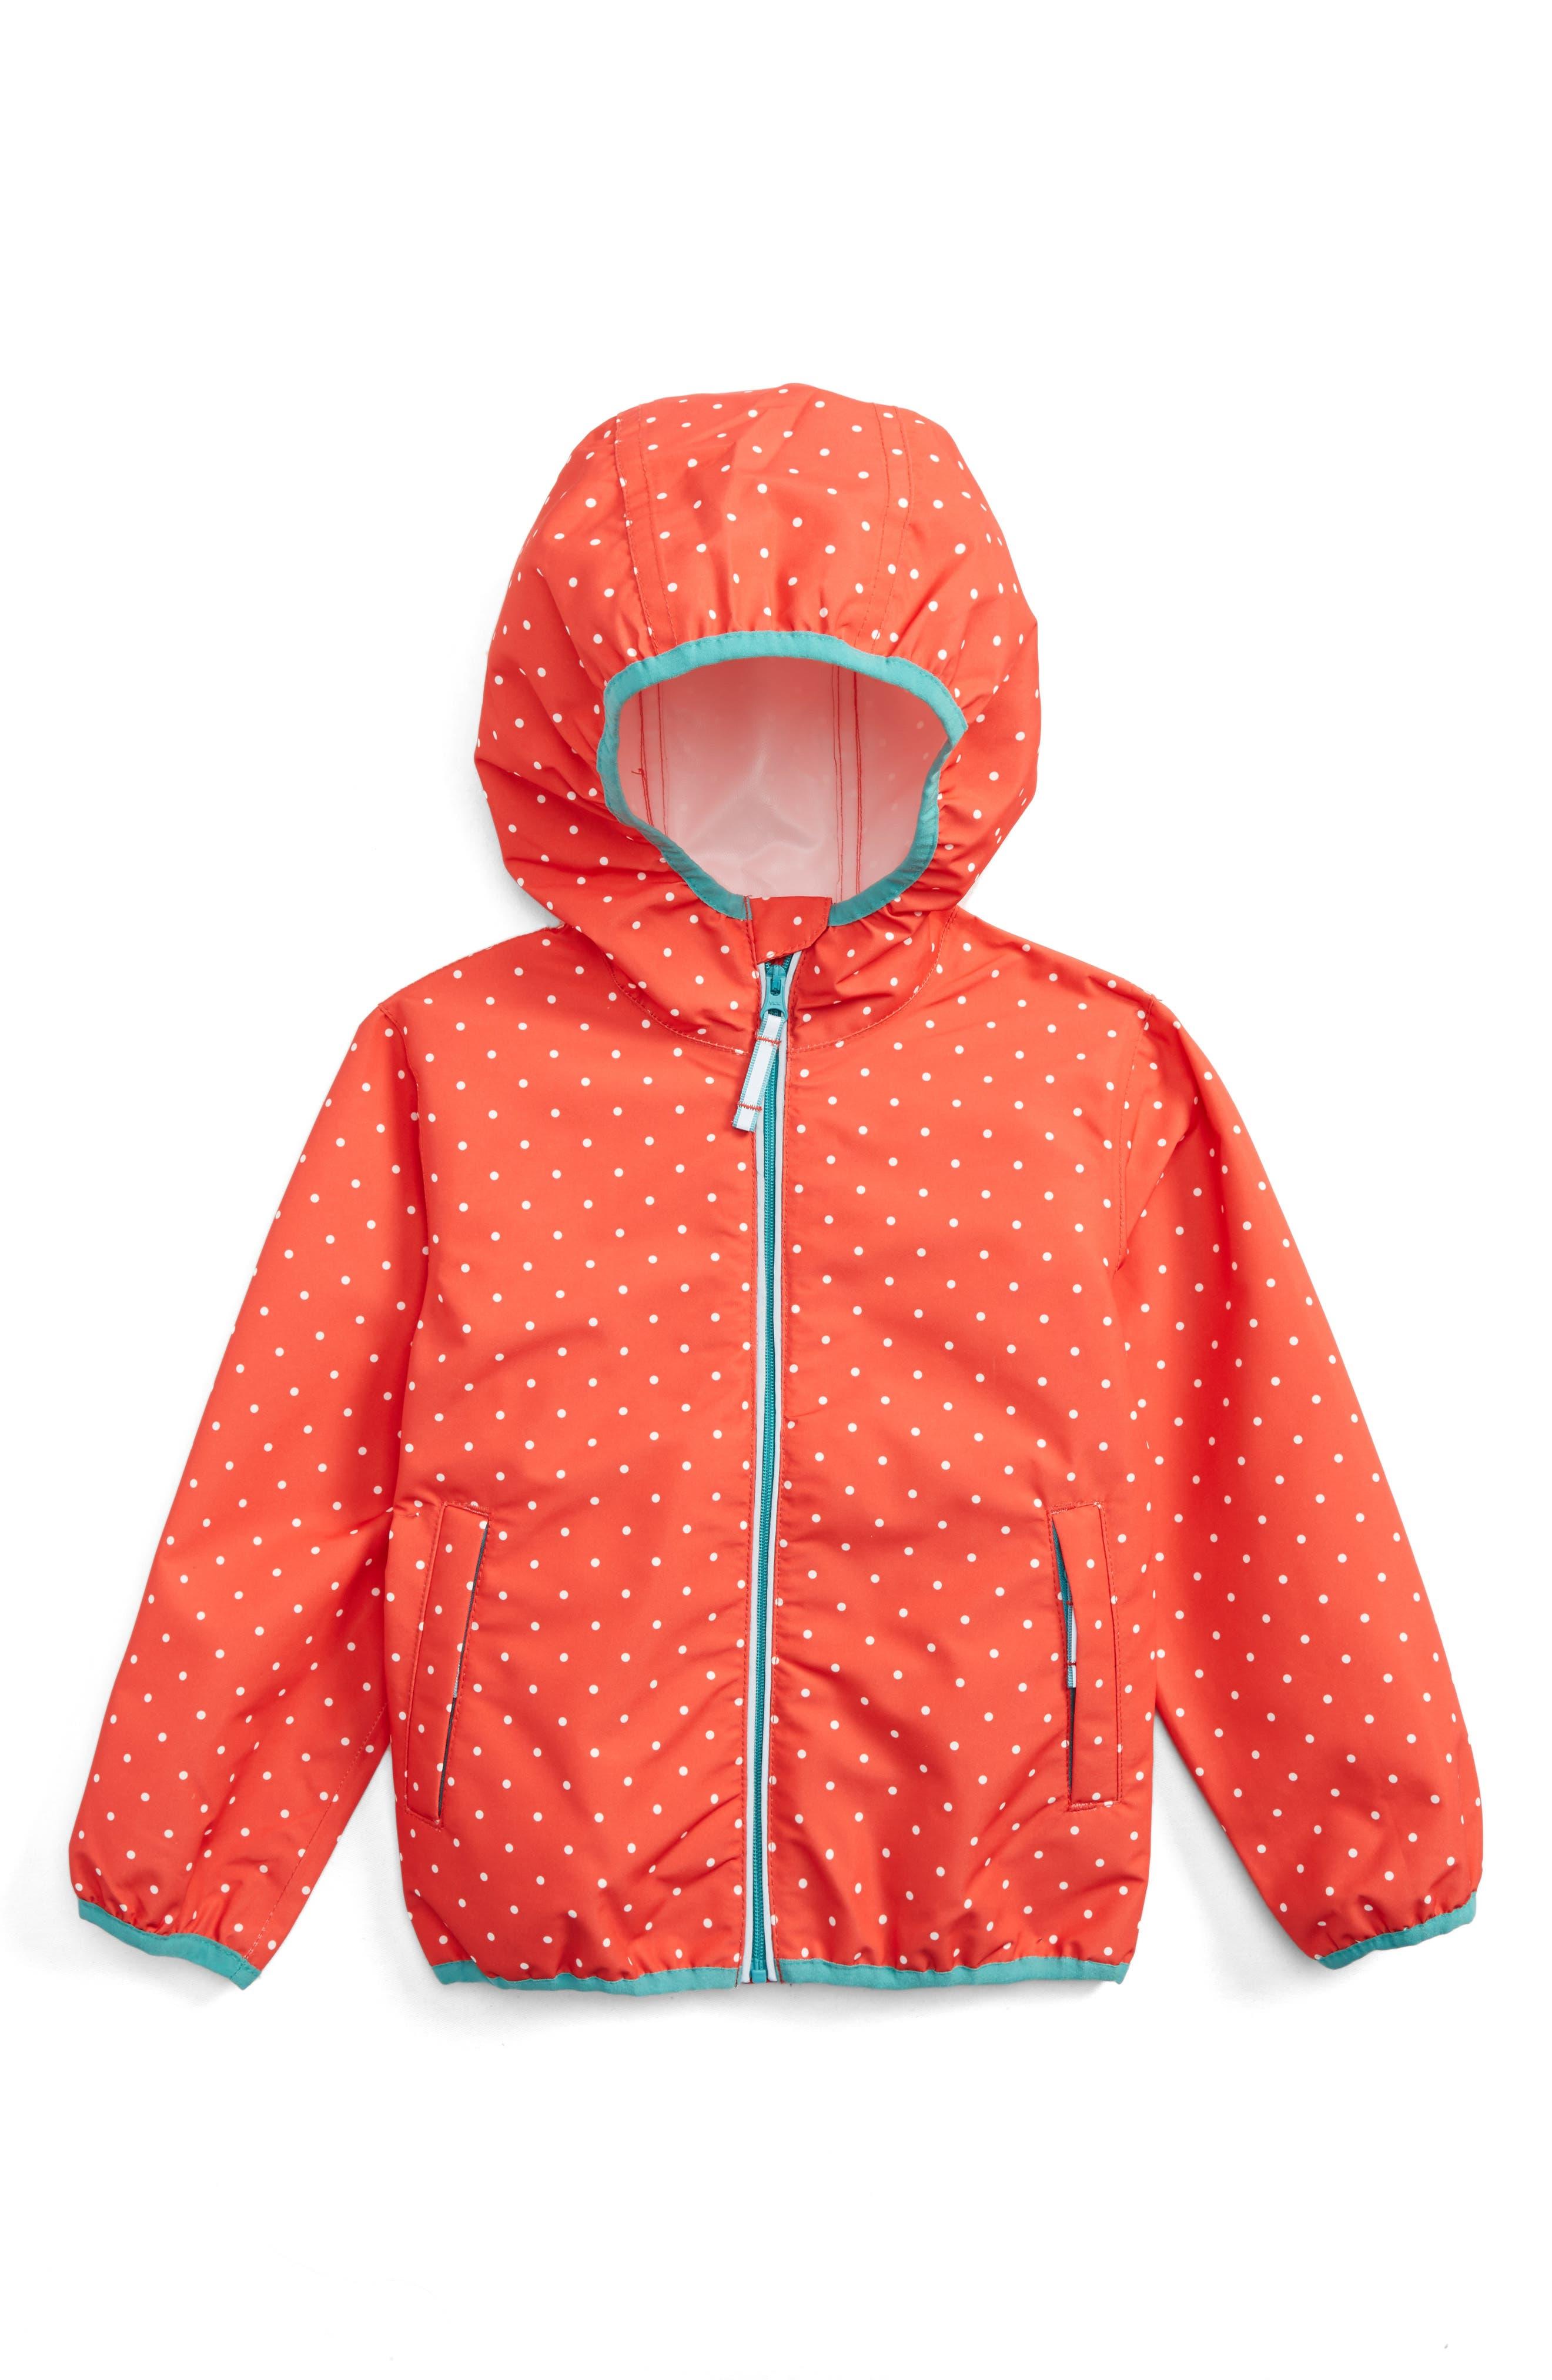 Packaway Waterproof Jacket,                             Main thumbnail 1, color,                             Red Jam Pin Spot